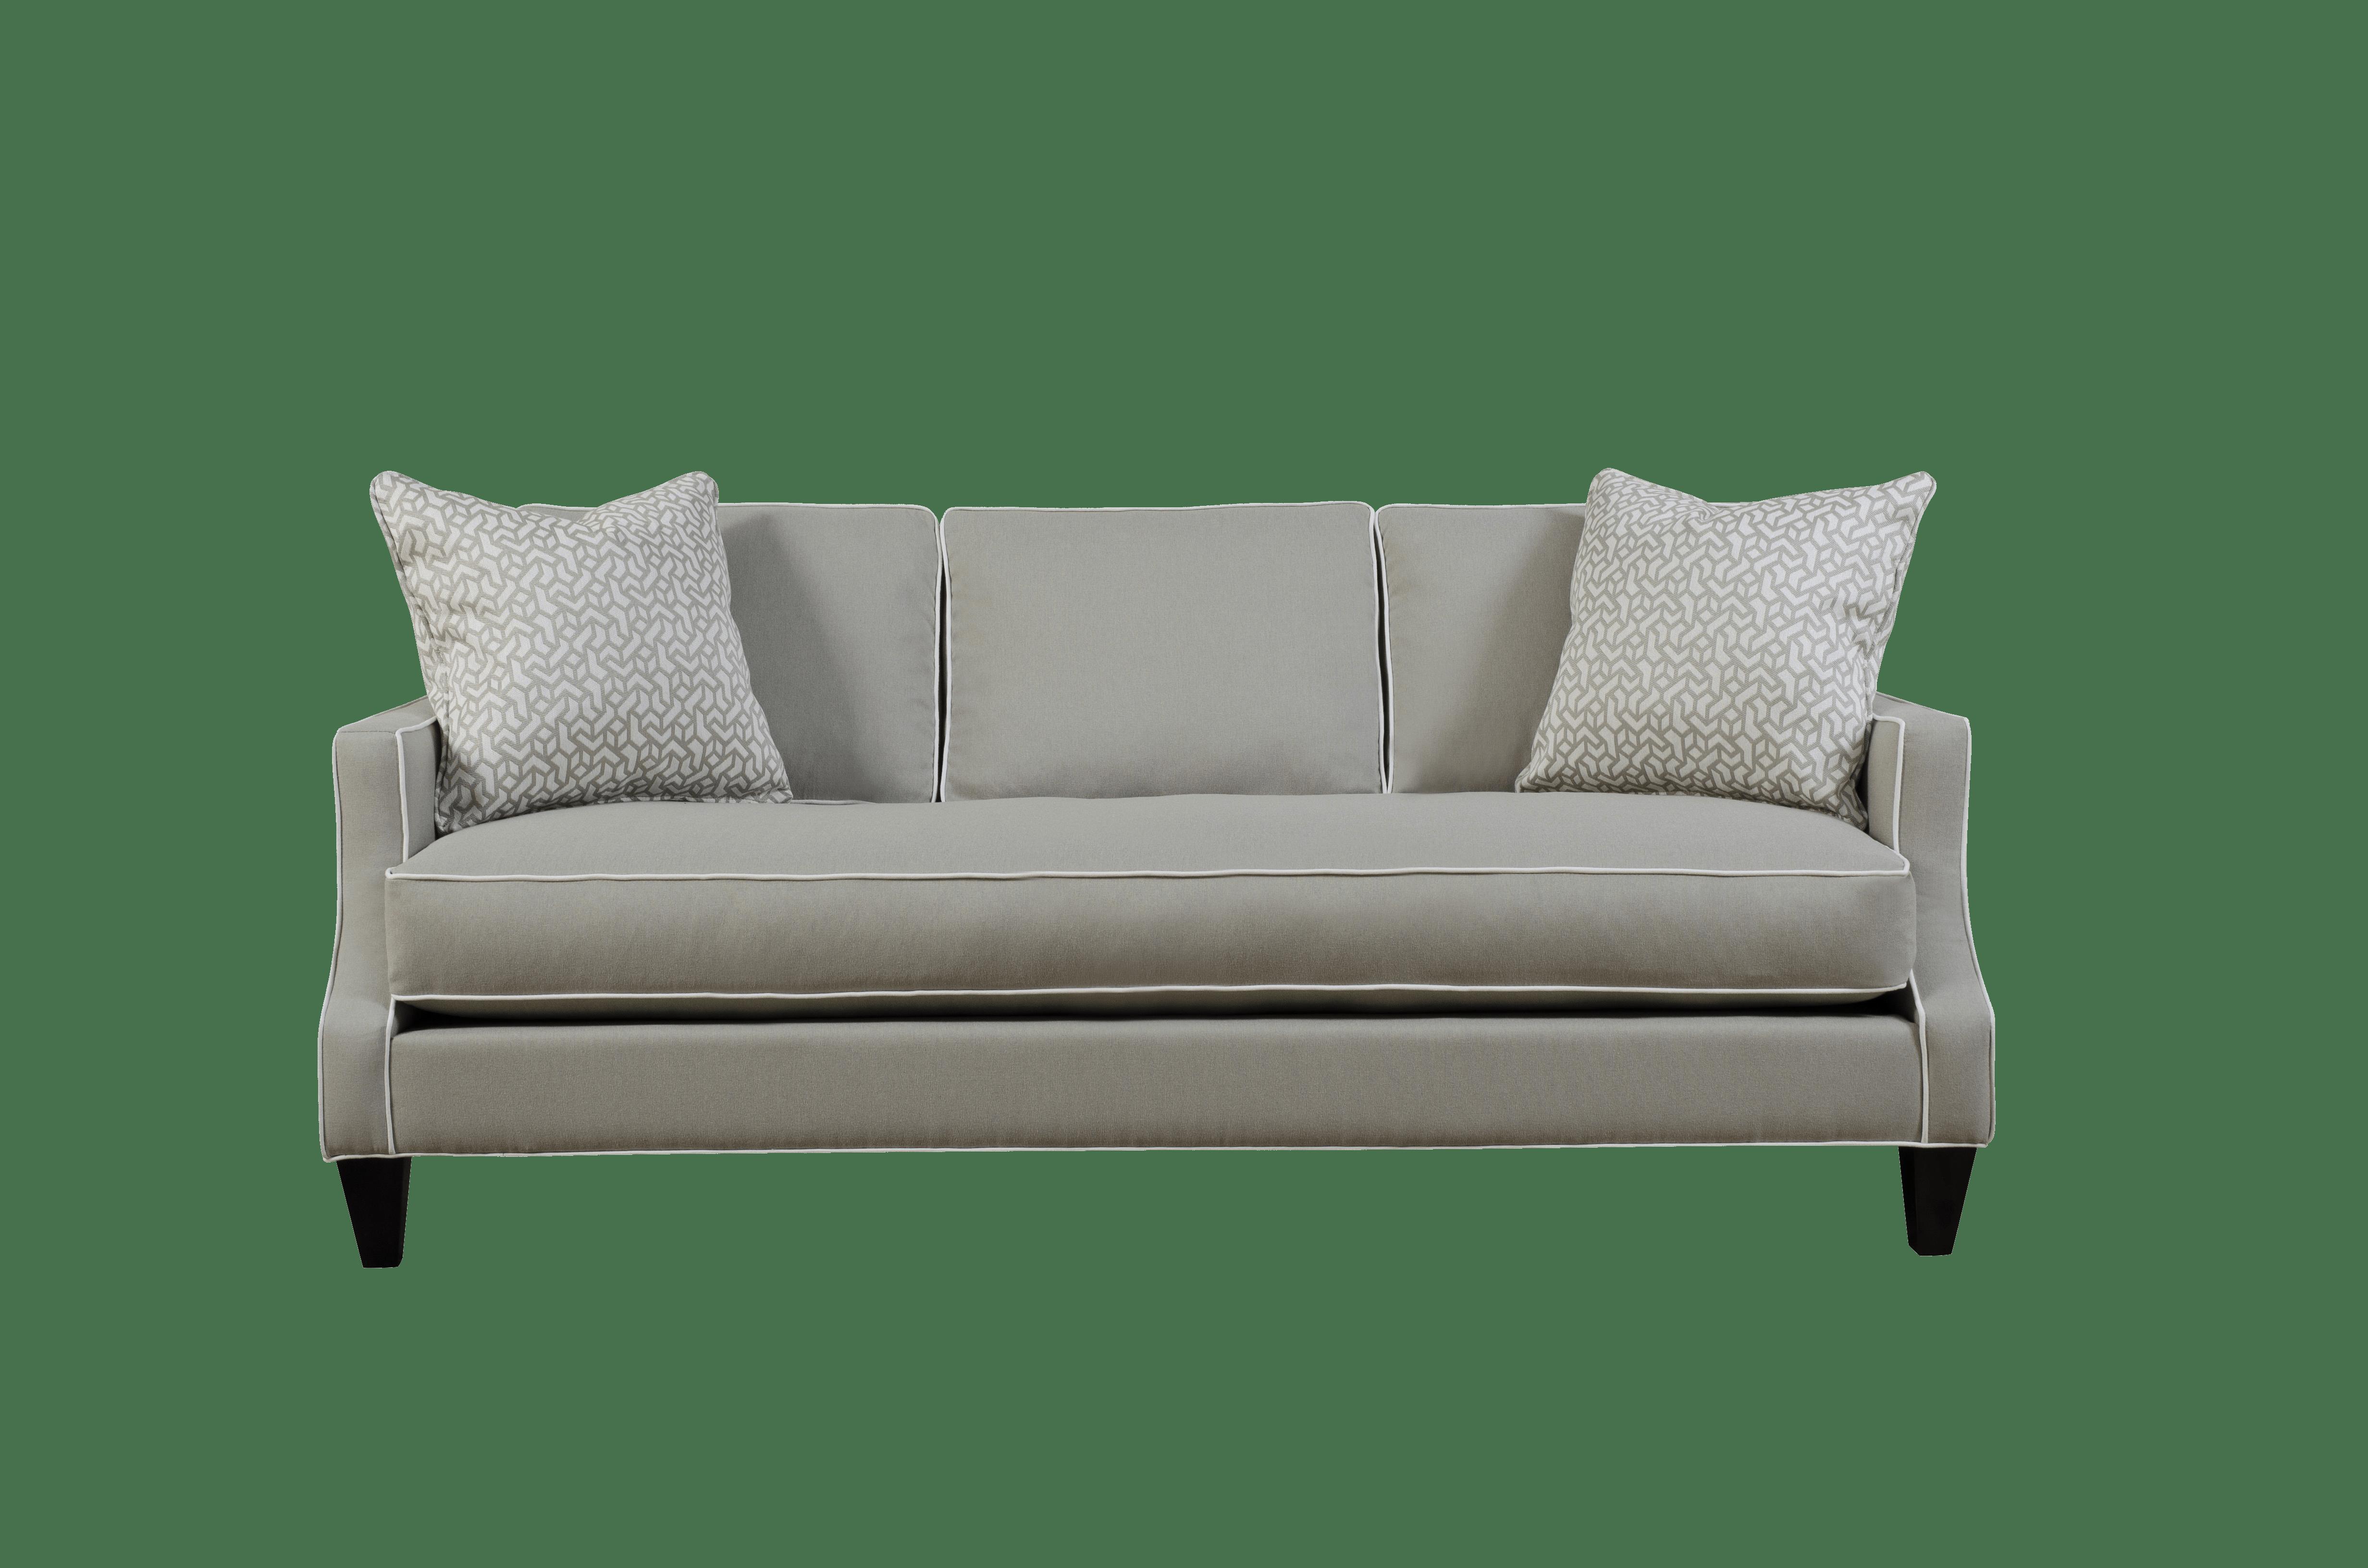 Groovy Blue Chip Furniture Unemploymentrelief Wooden Chair Designs For Living Room Unemploymentrelieforg